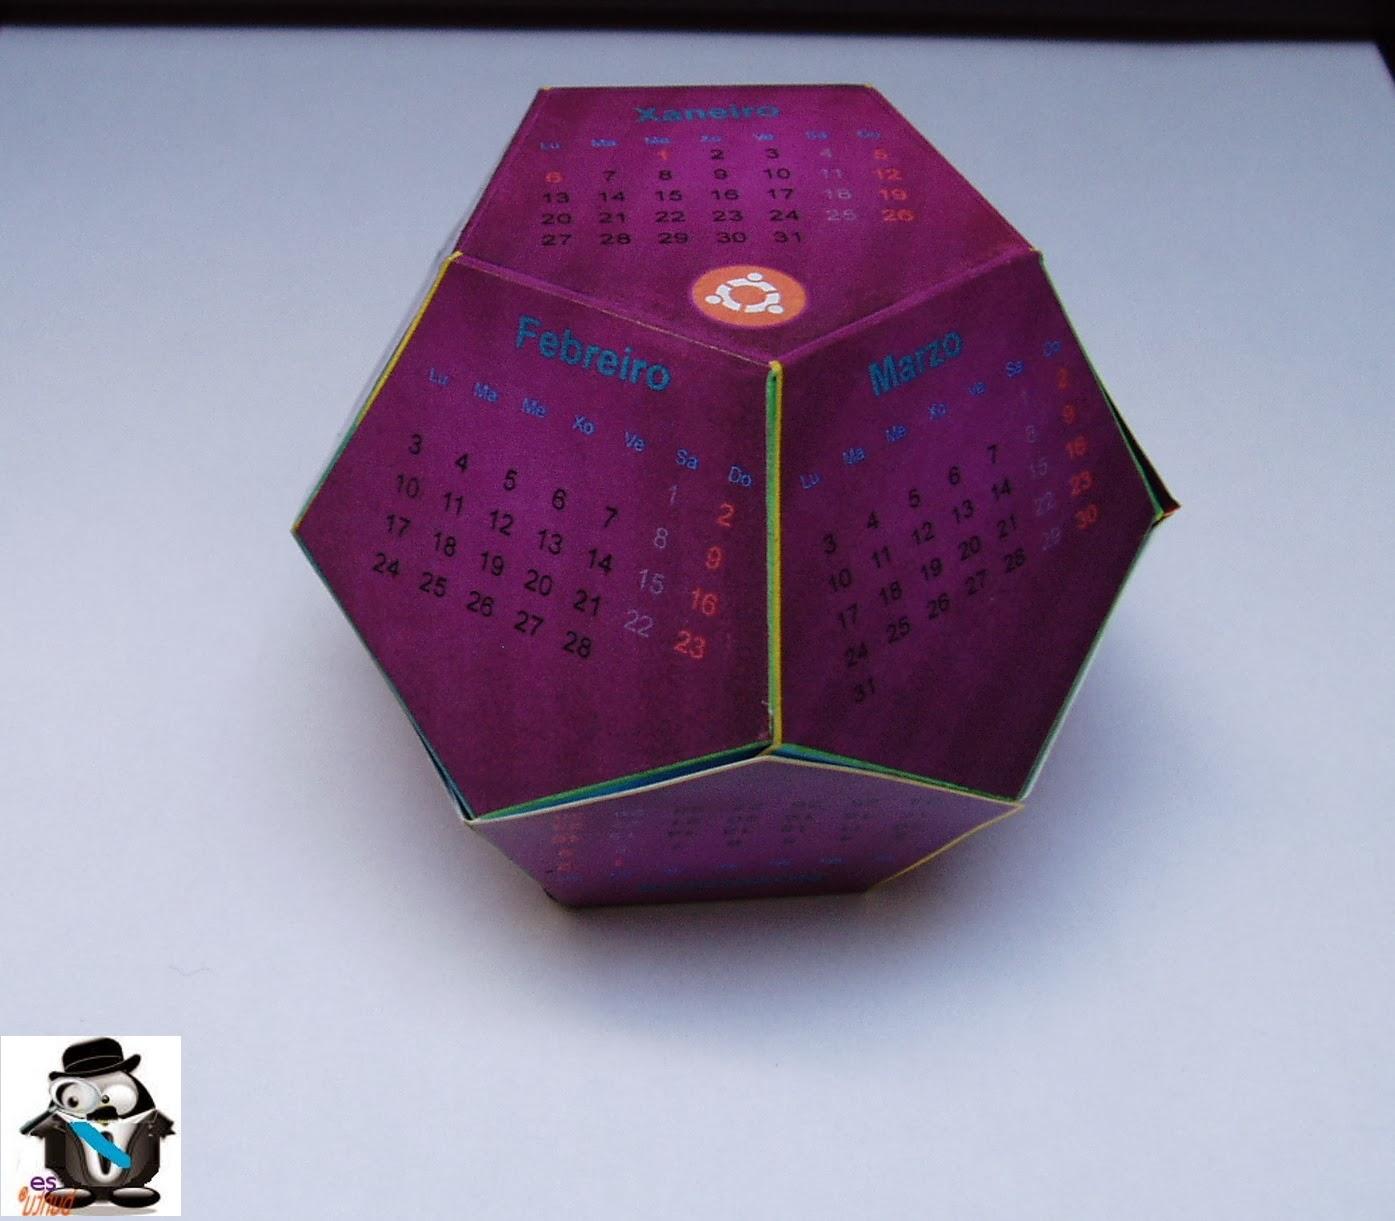 Calendario dodecaedro Ubuntu 2014 gallego